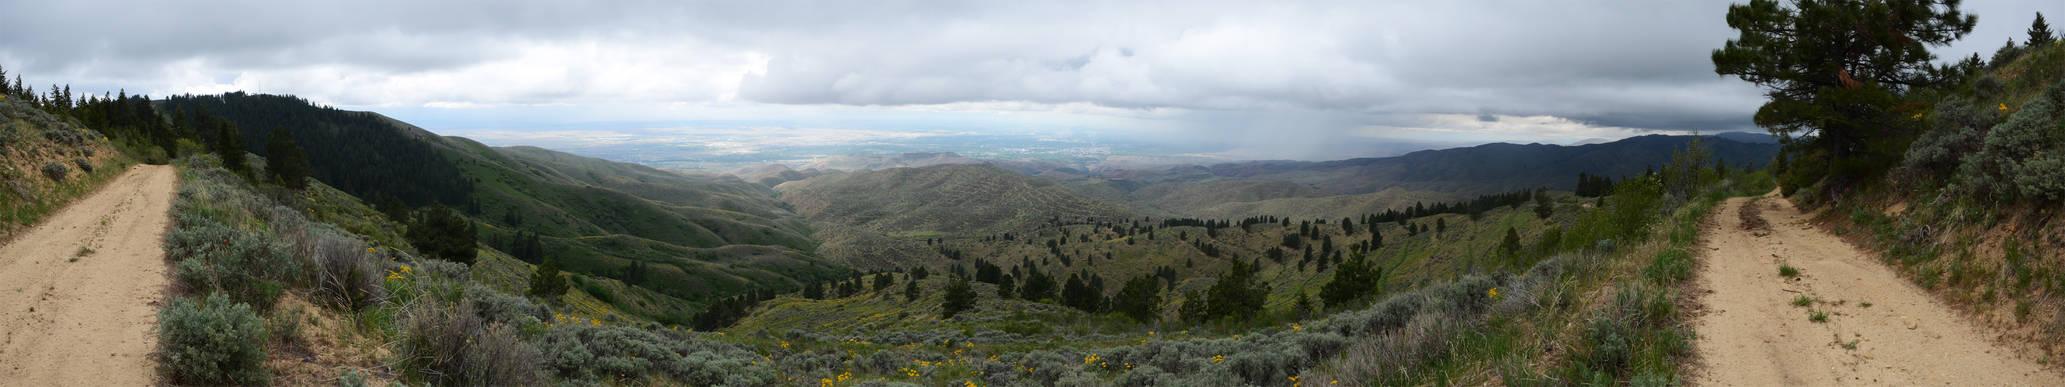 Lucky Peak Hike 2013-05-17 1